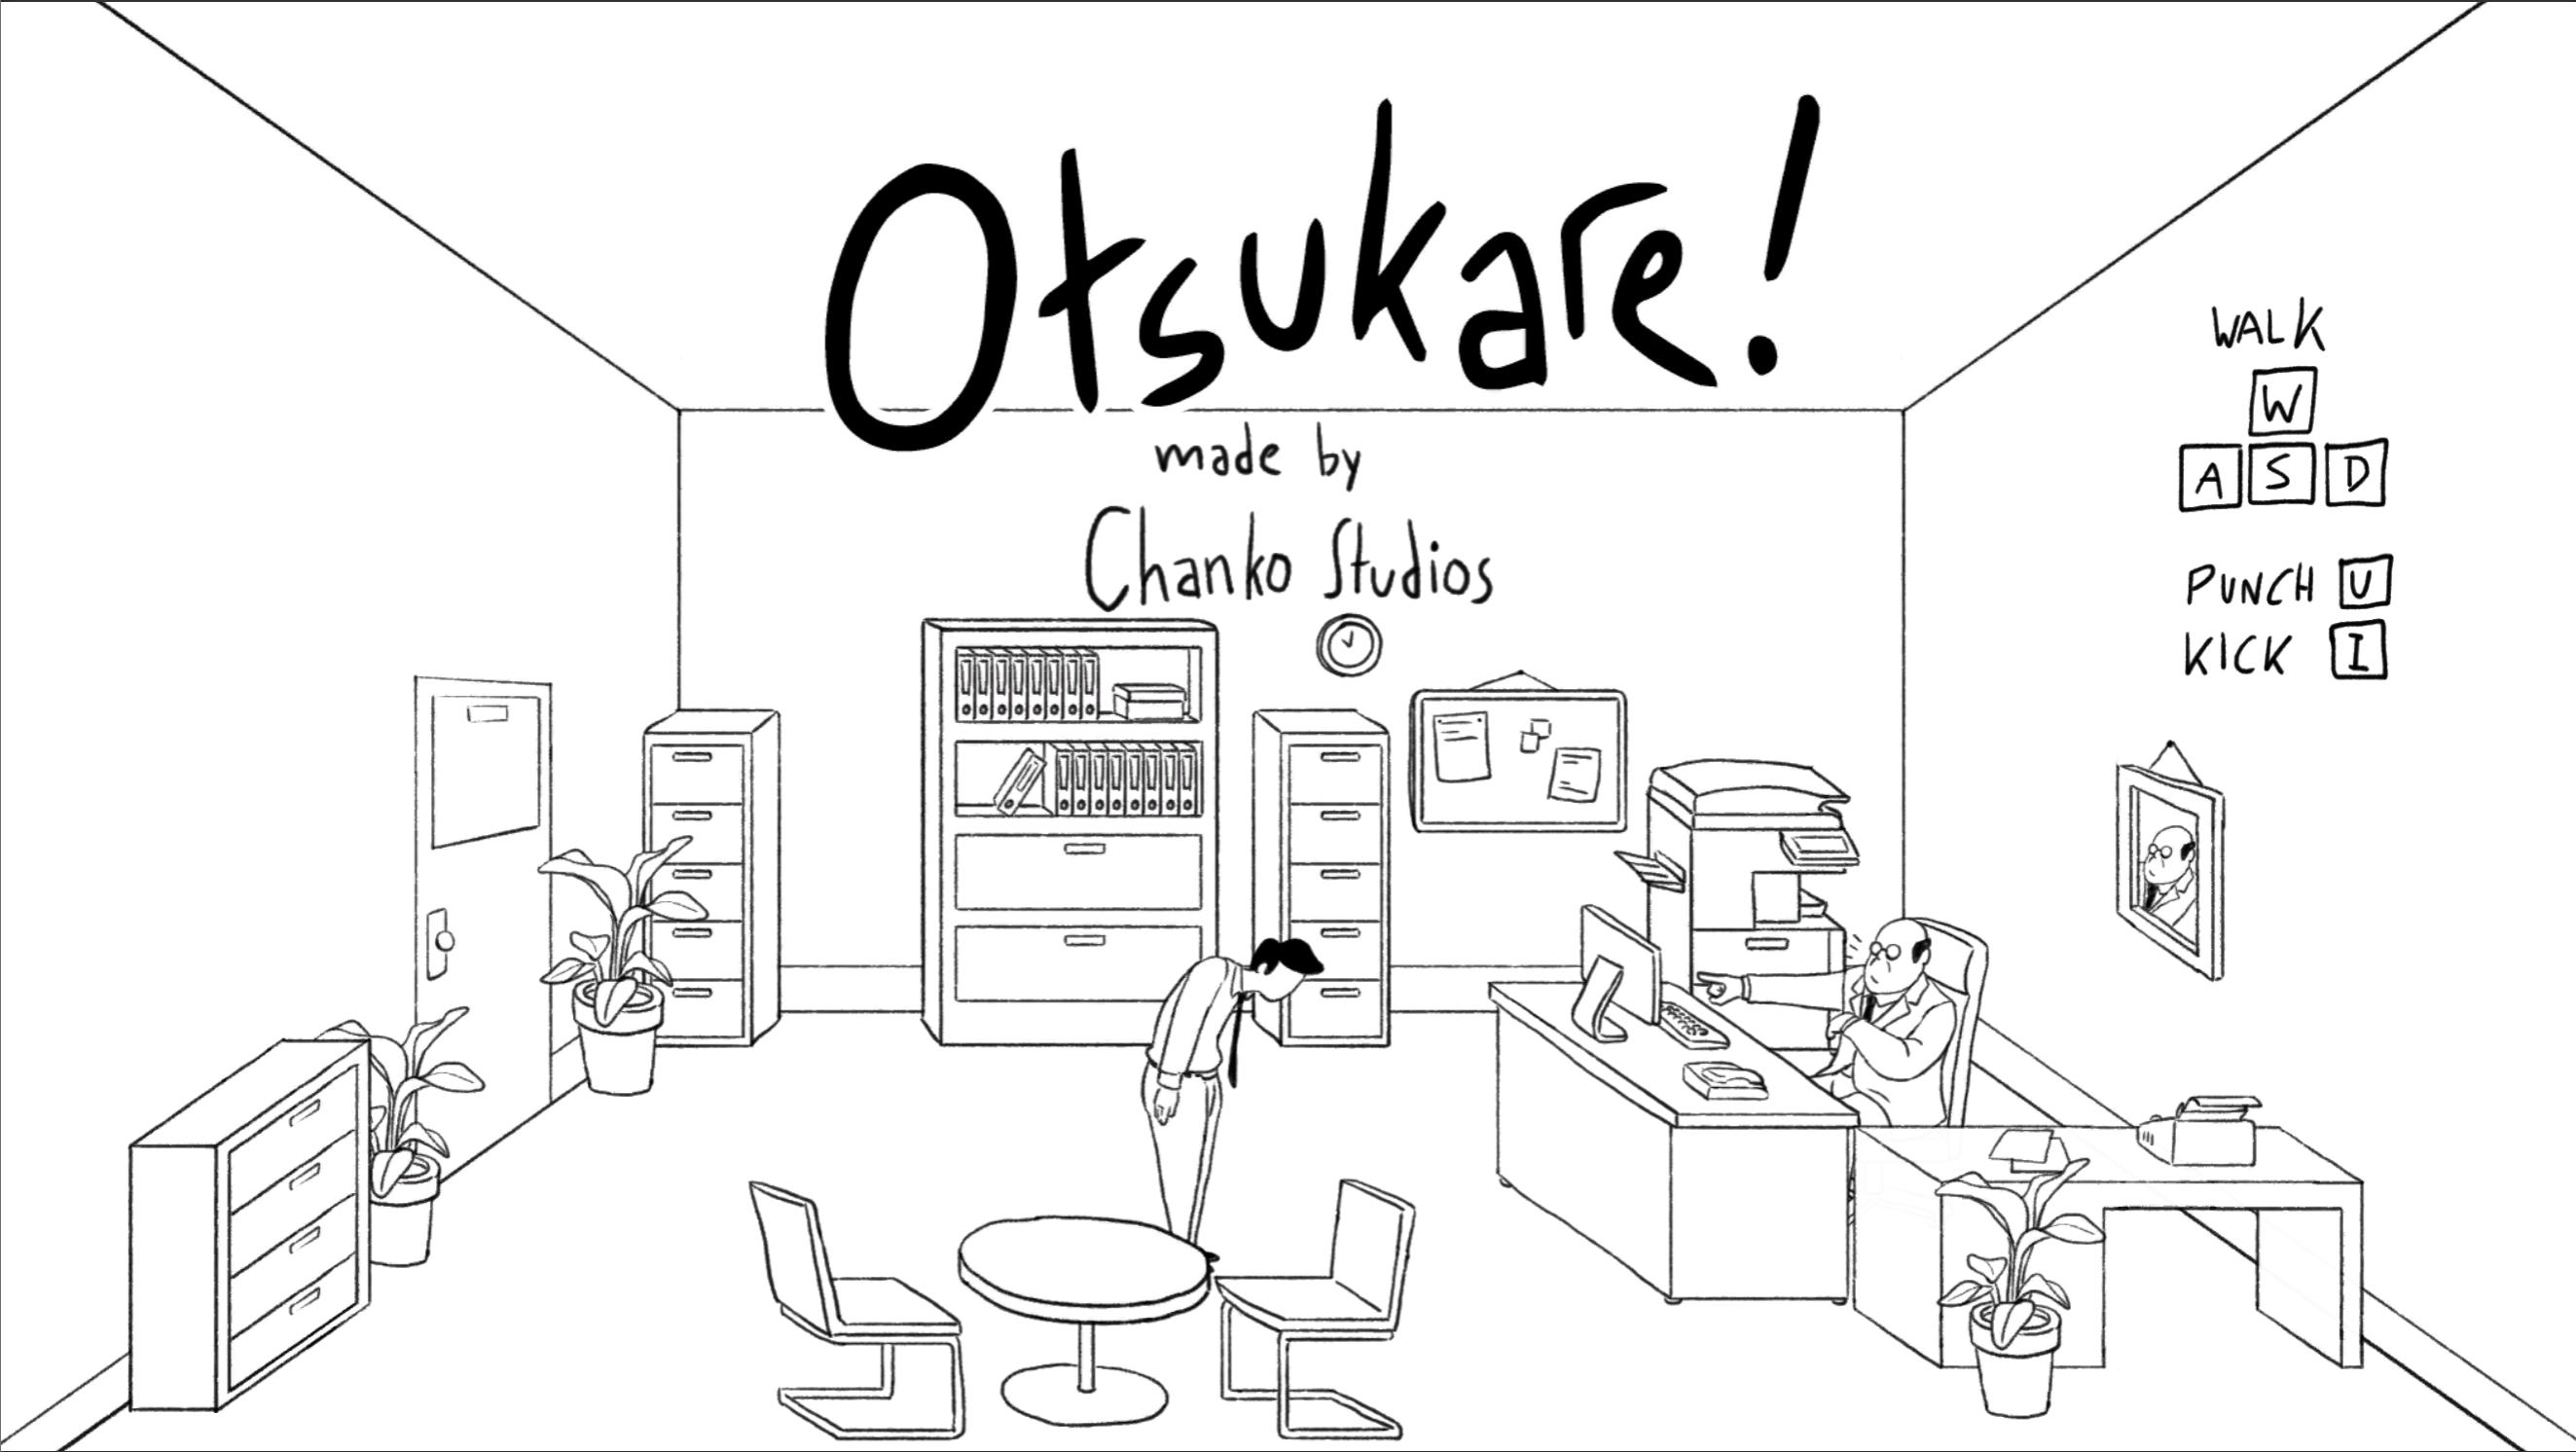 Otsukare!